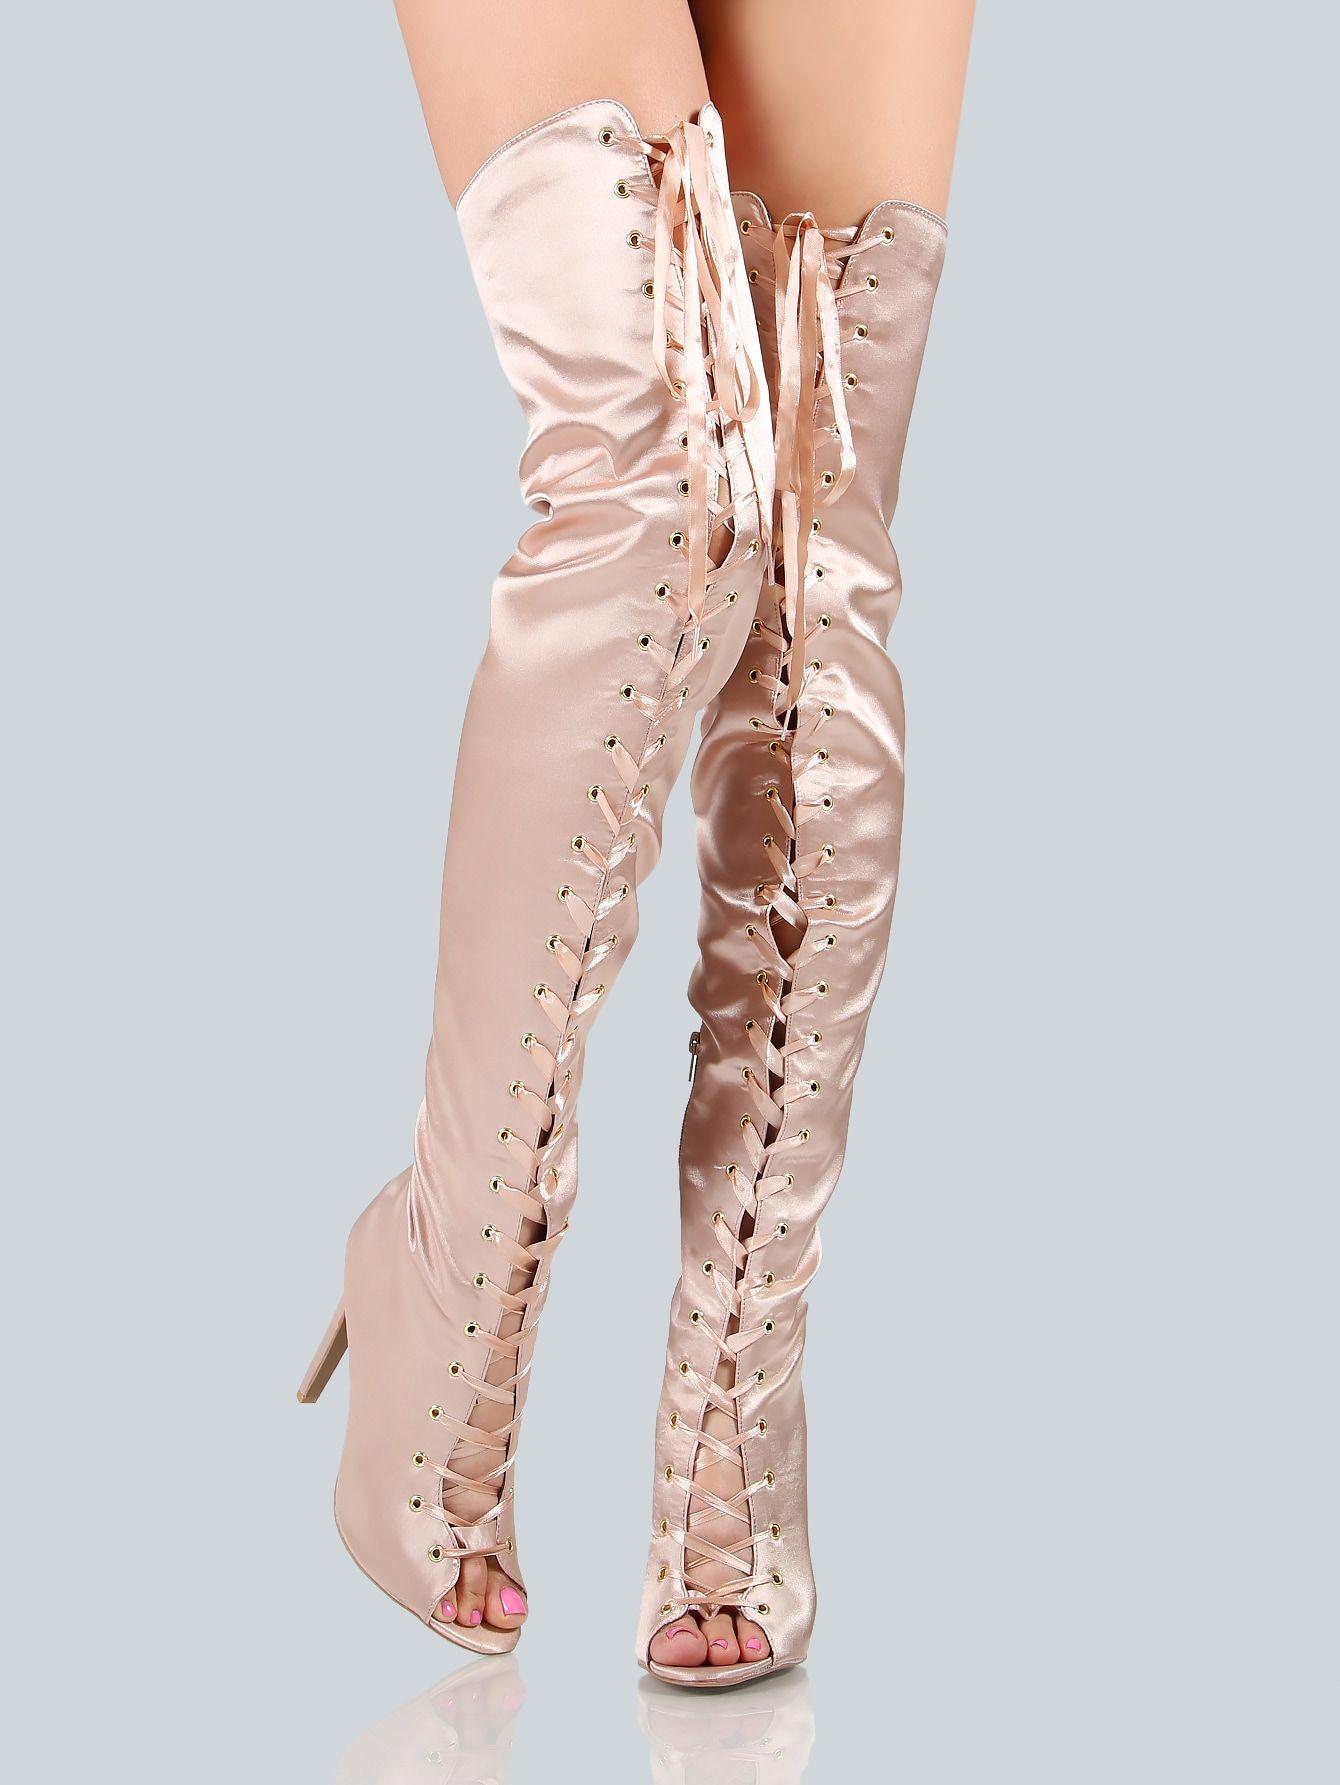 71fd821c803 Glamorous OTK/Thigh High No zipper Champagne High Heel Stiletto Lace ...